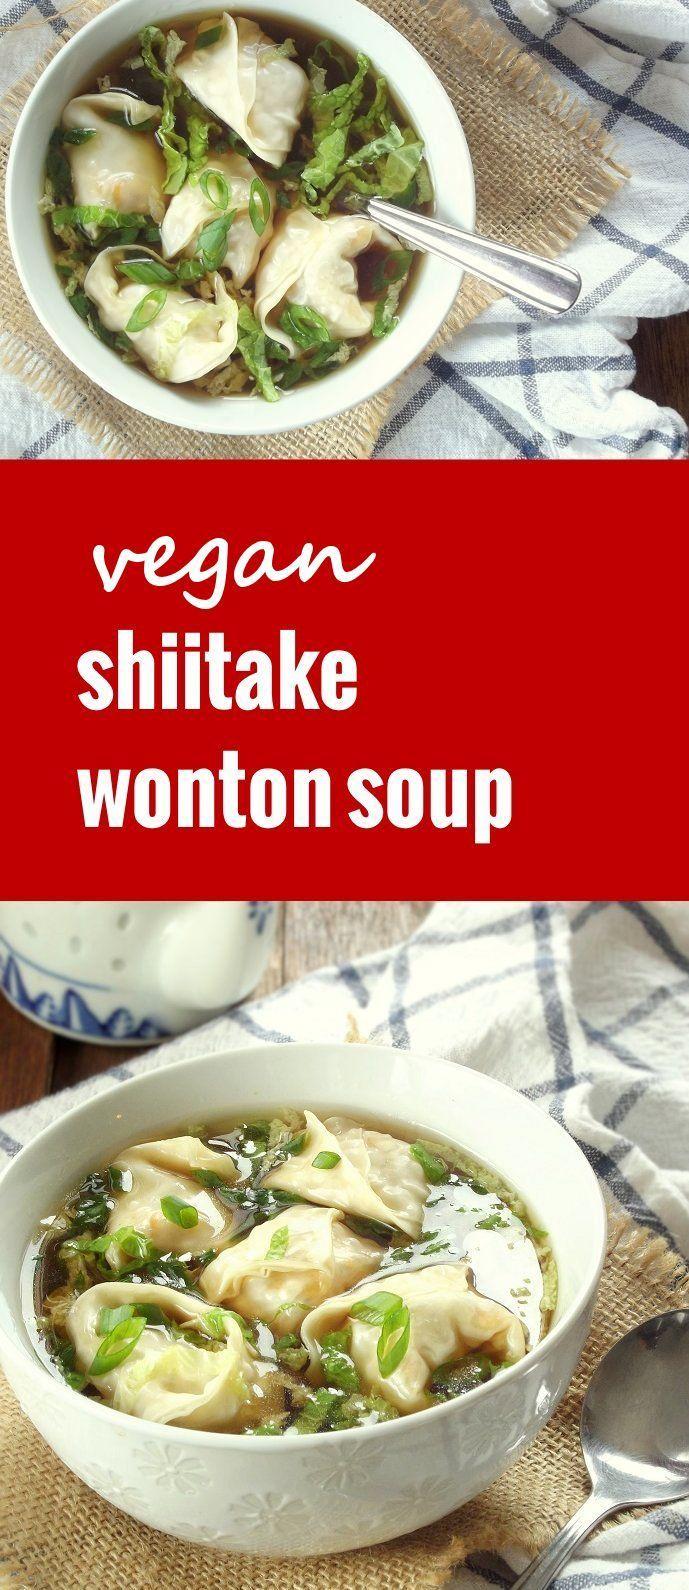 This vegan wonton soup is made with savory shiitake stuffed wontons, crispy napa cabbage and a light gingery broth.